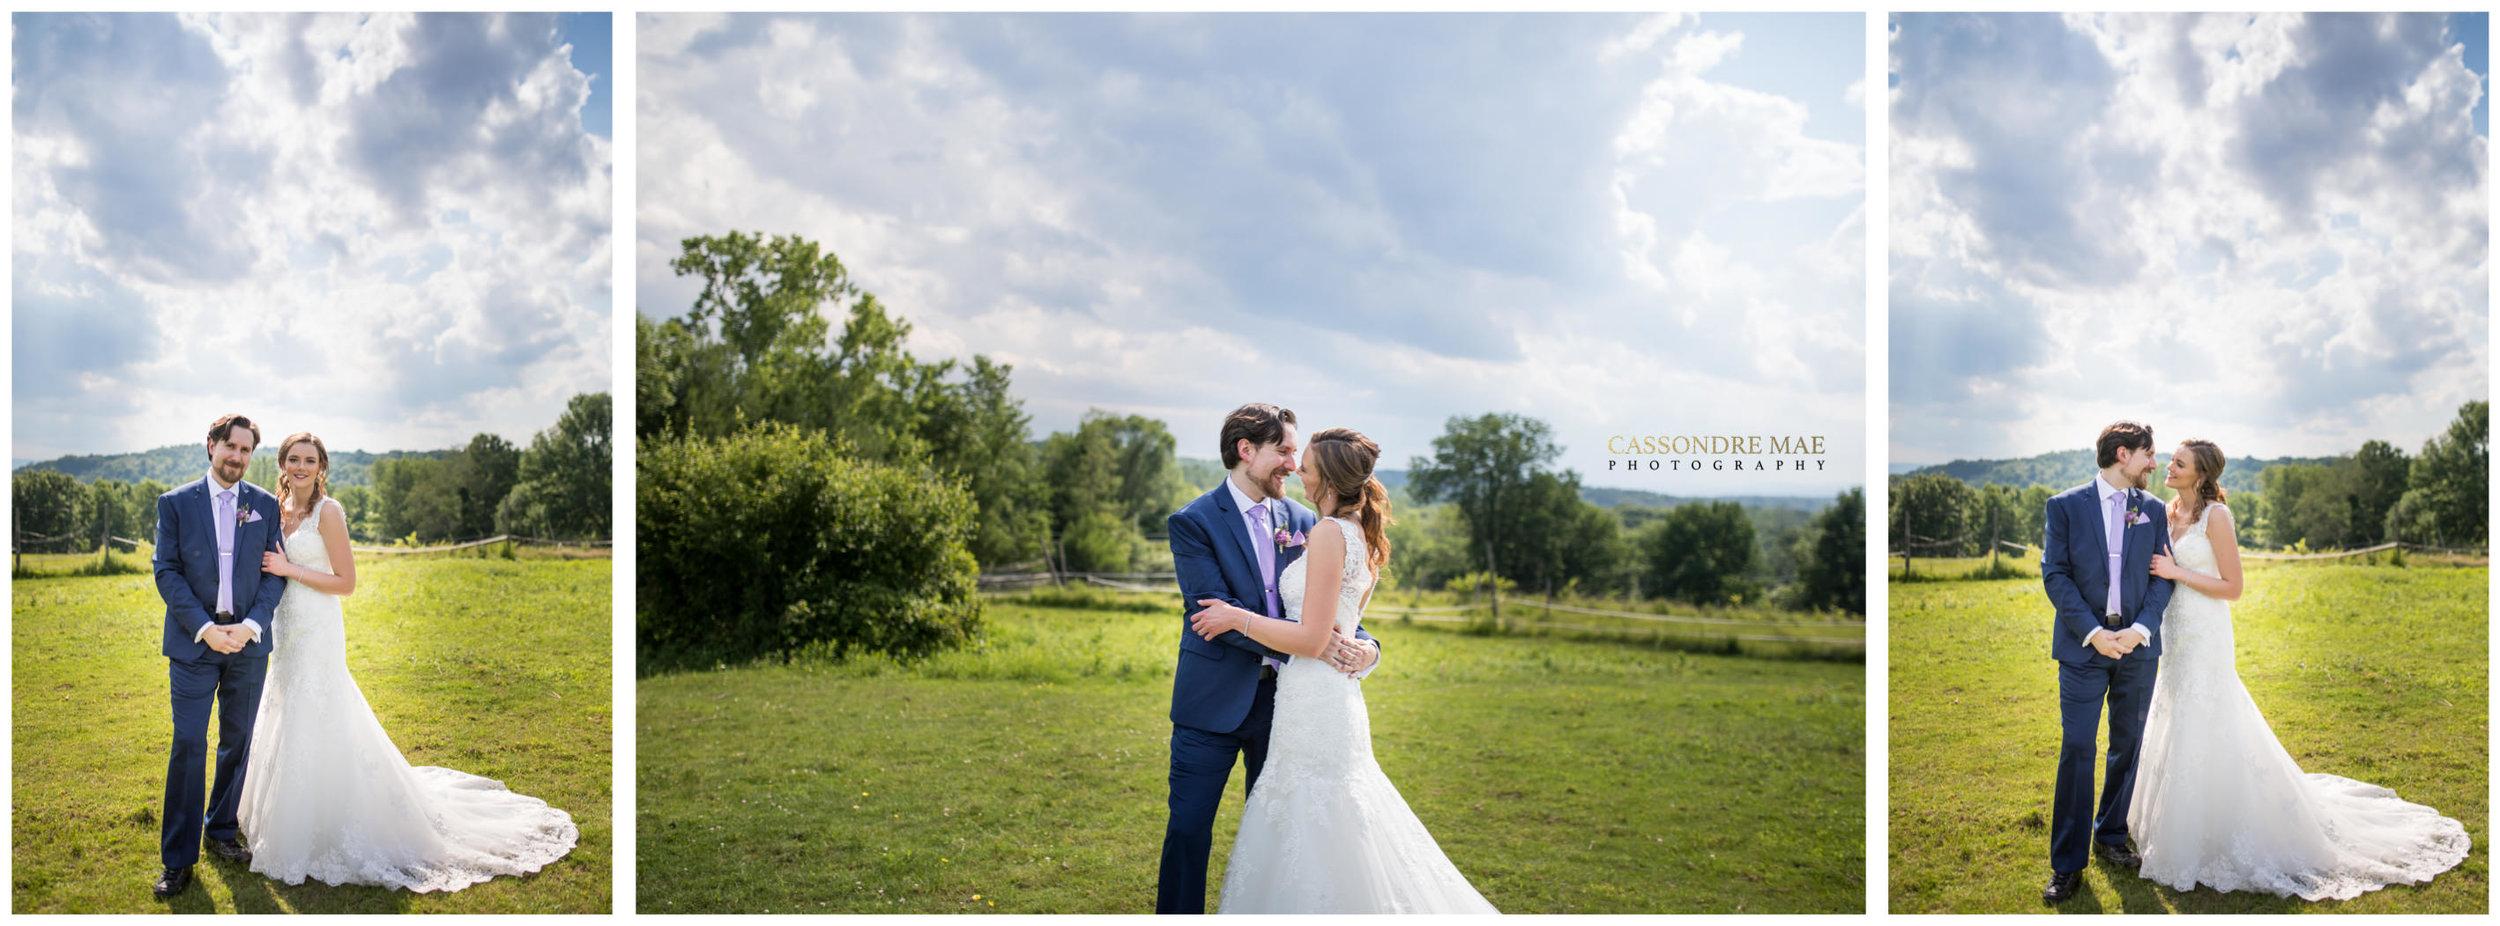 Cassondre Mae Photography hudson valley barn weddings -7.jpg